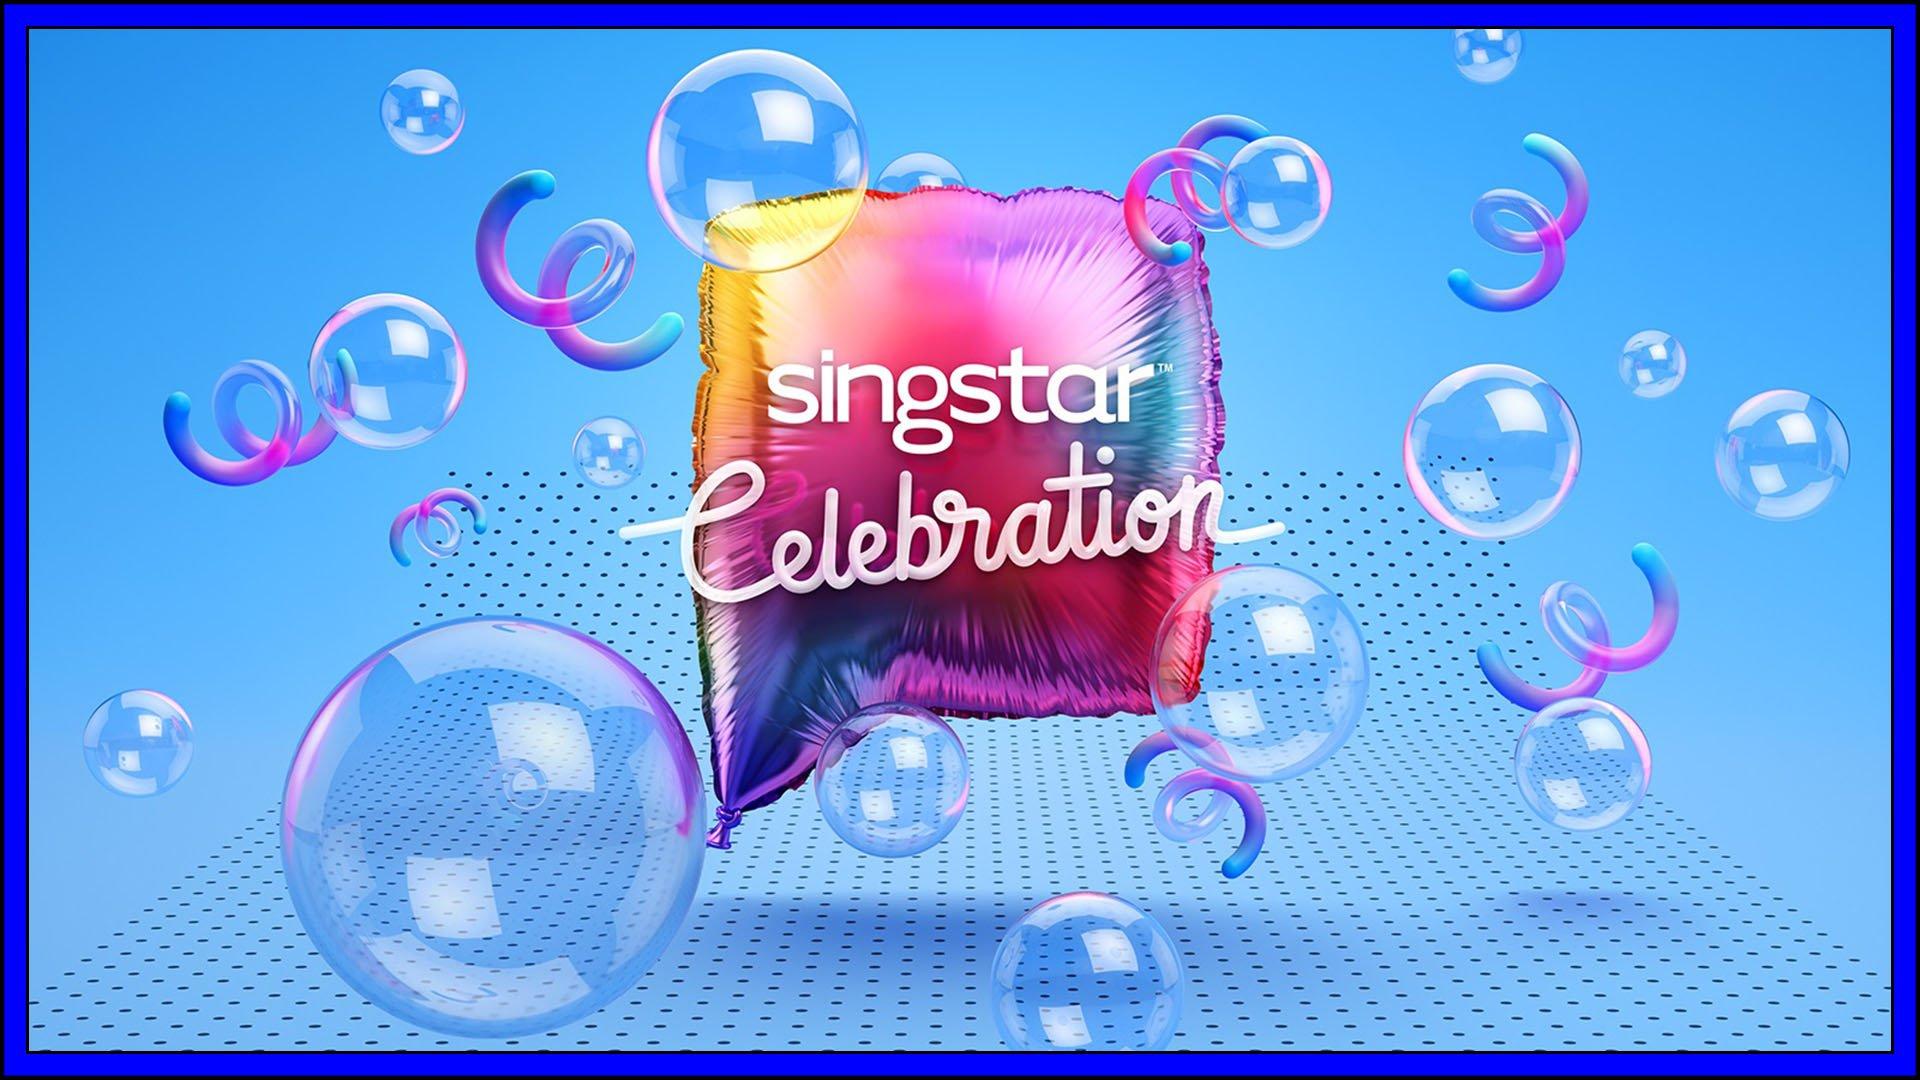 Singstar Celebration Fi3